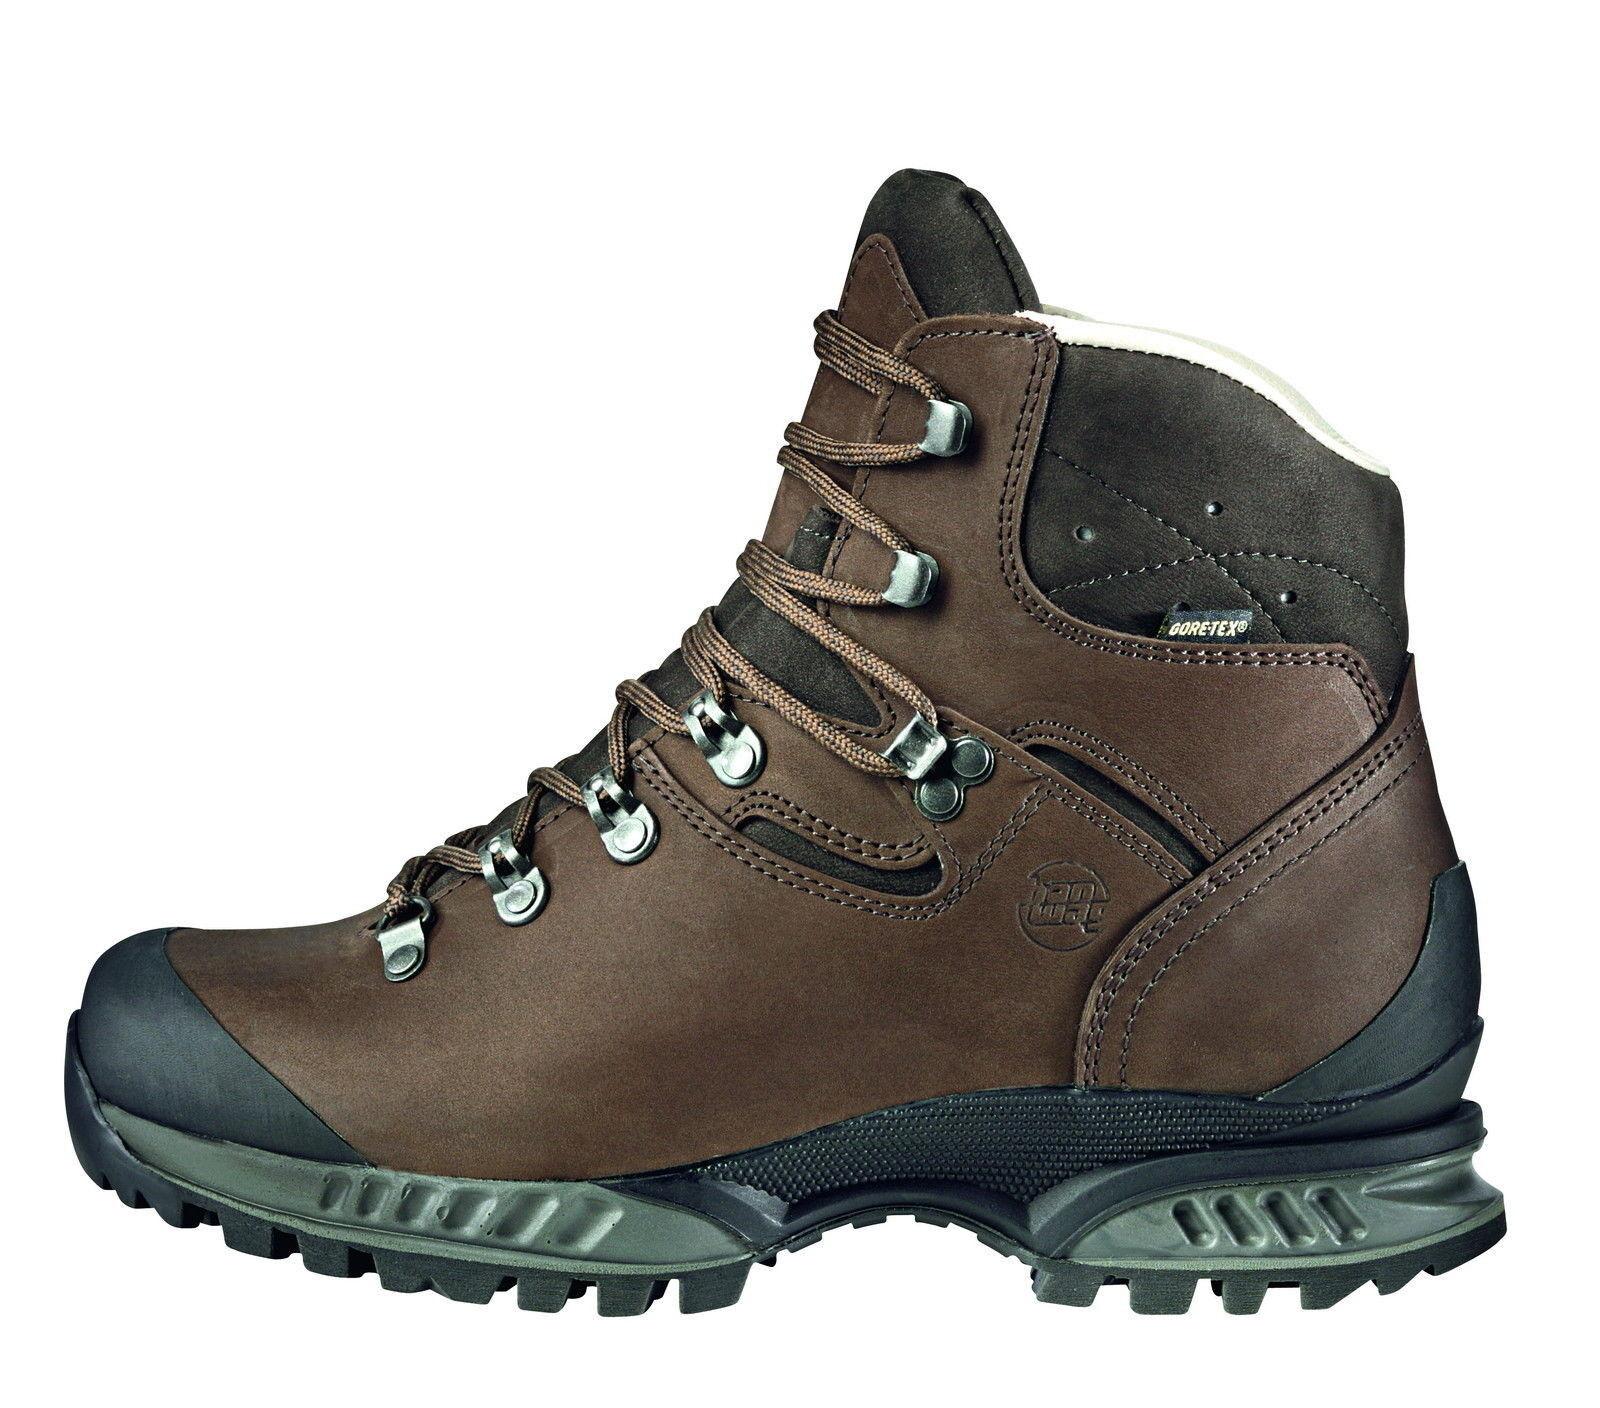 New Hanwag Trekking shoes Tatra Wide GTX Size 7 (40,5), Earth